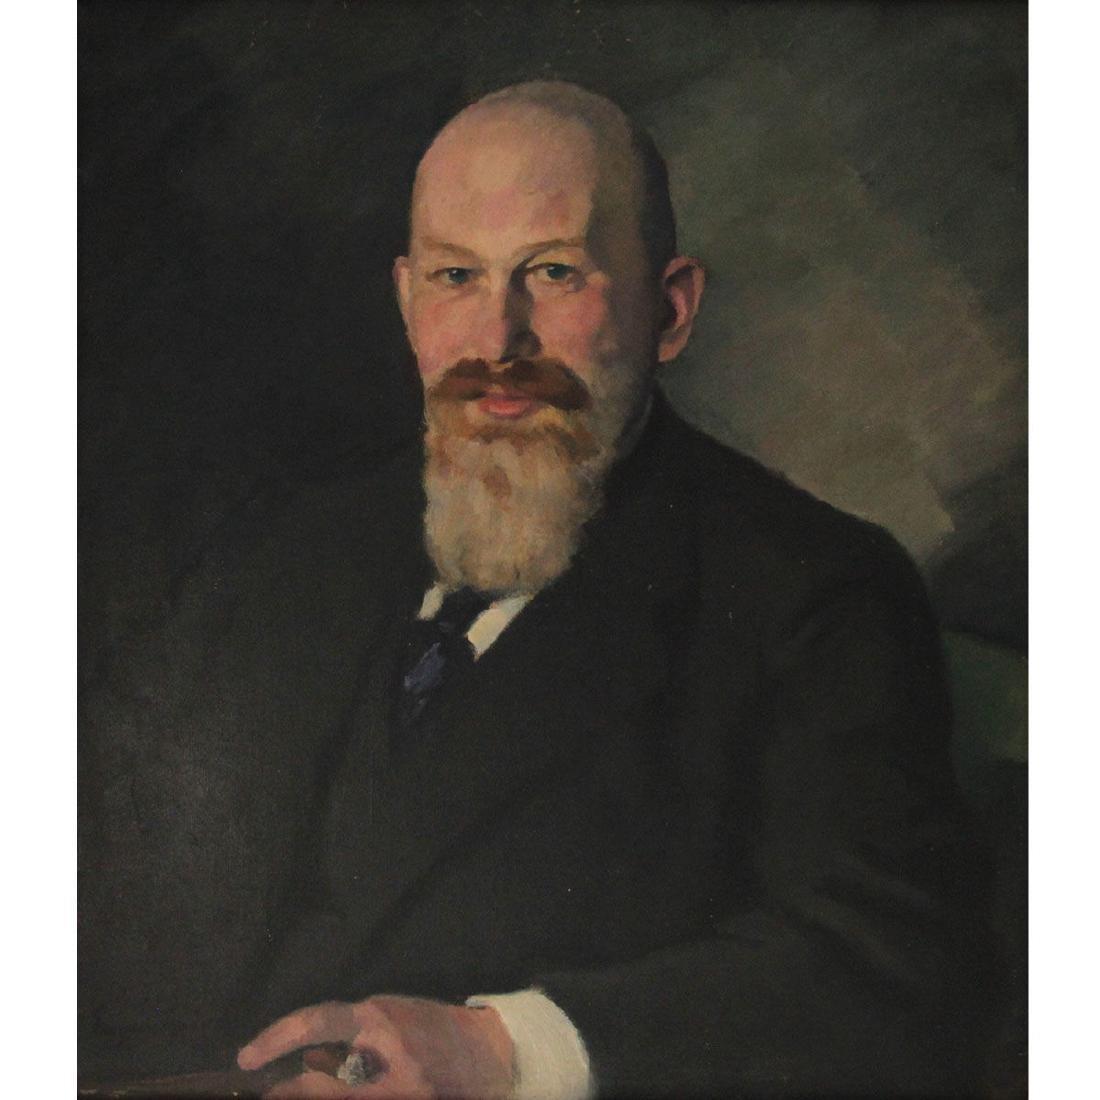 Eugen Spiro (1874-1972) - Isaac Ephraim Portrait, Oil